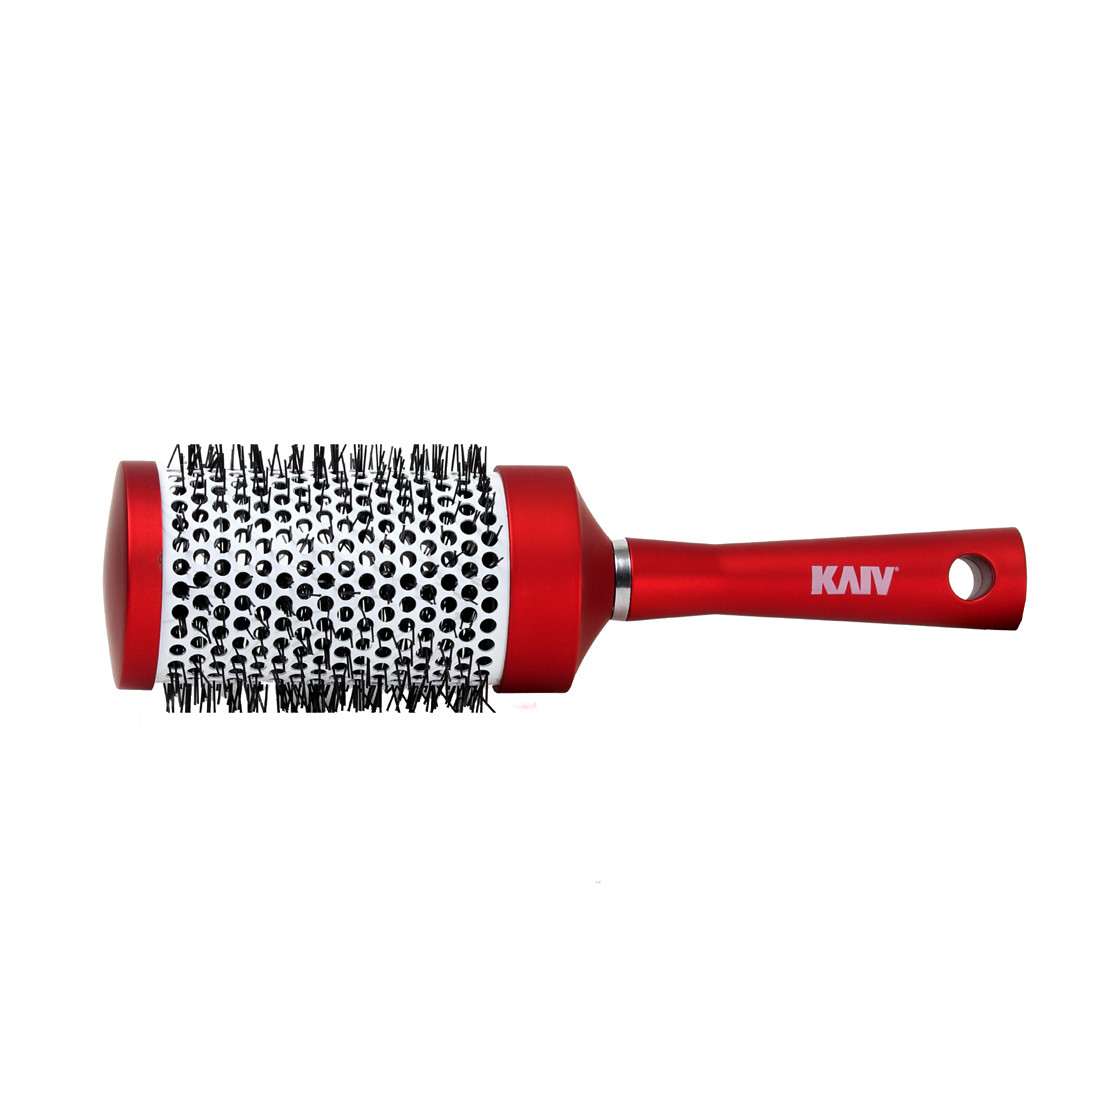 Kaiv Professional Barrel Hair Brush (61mm)